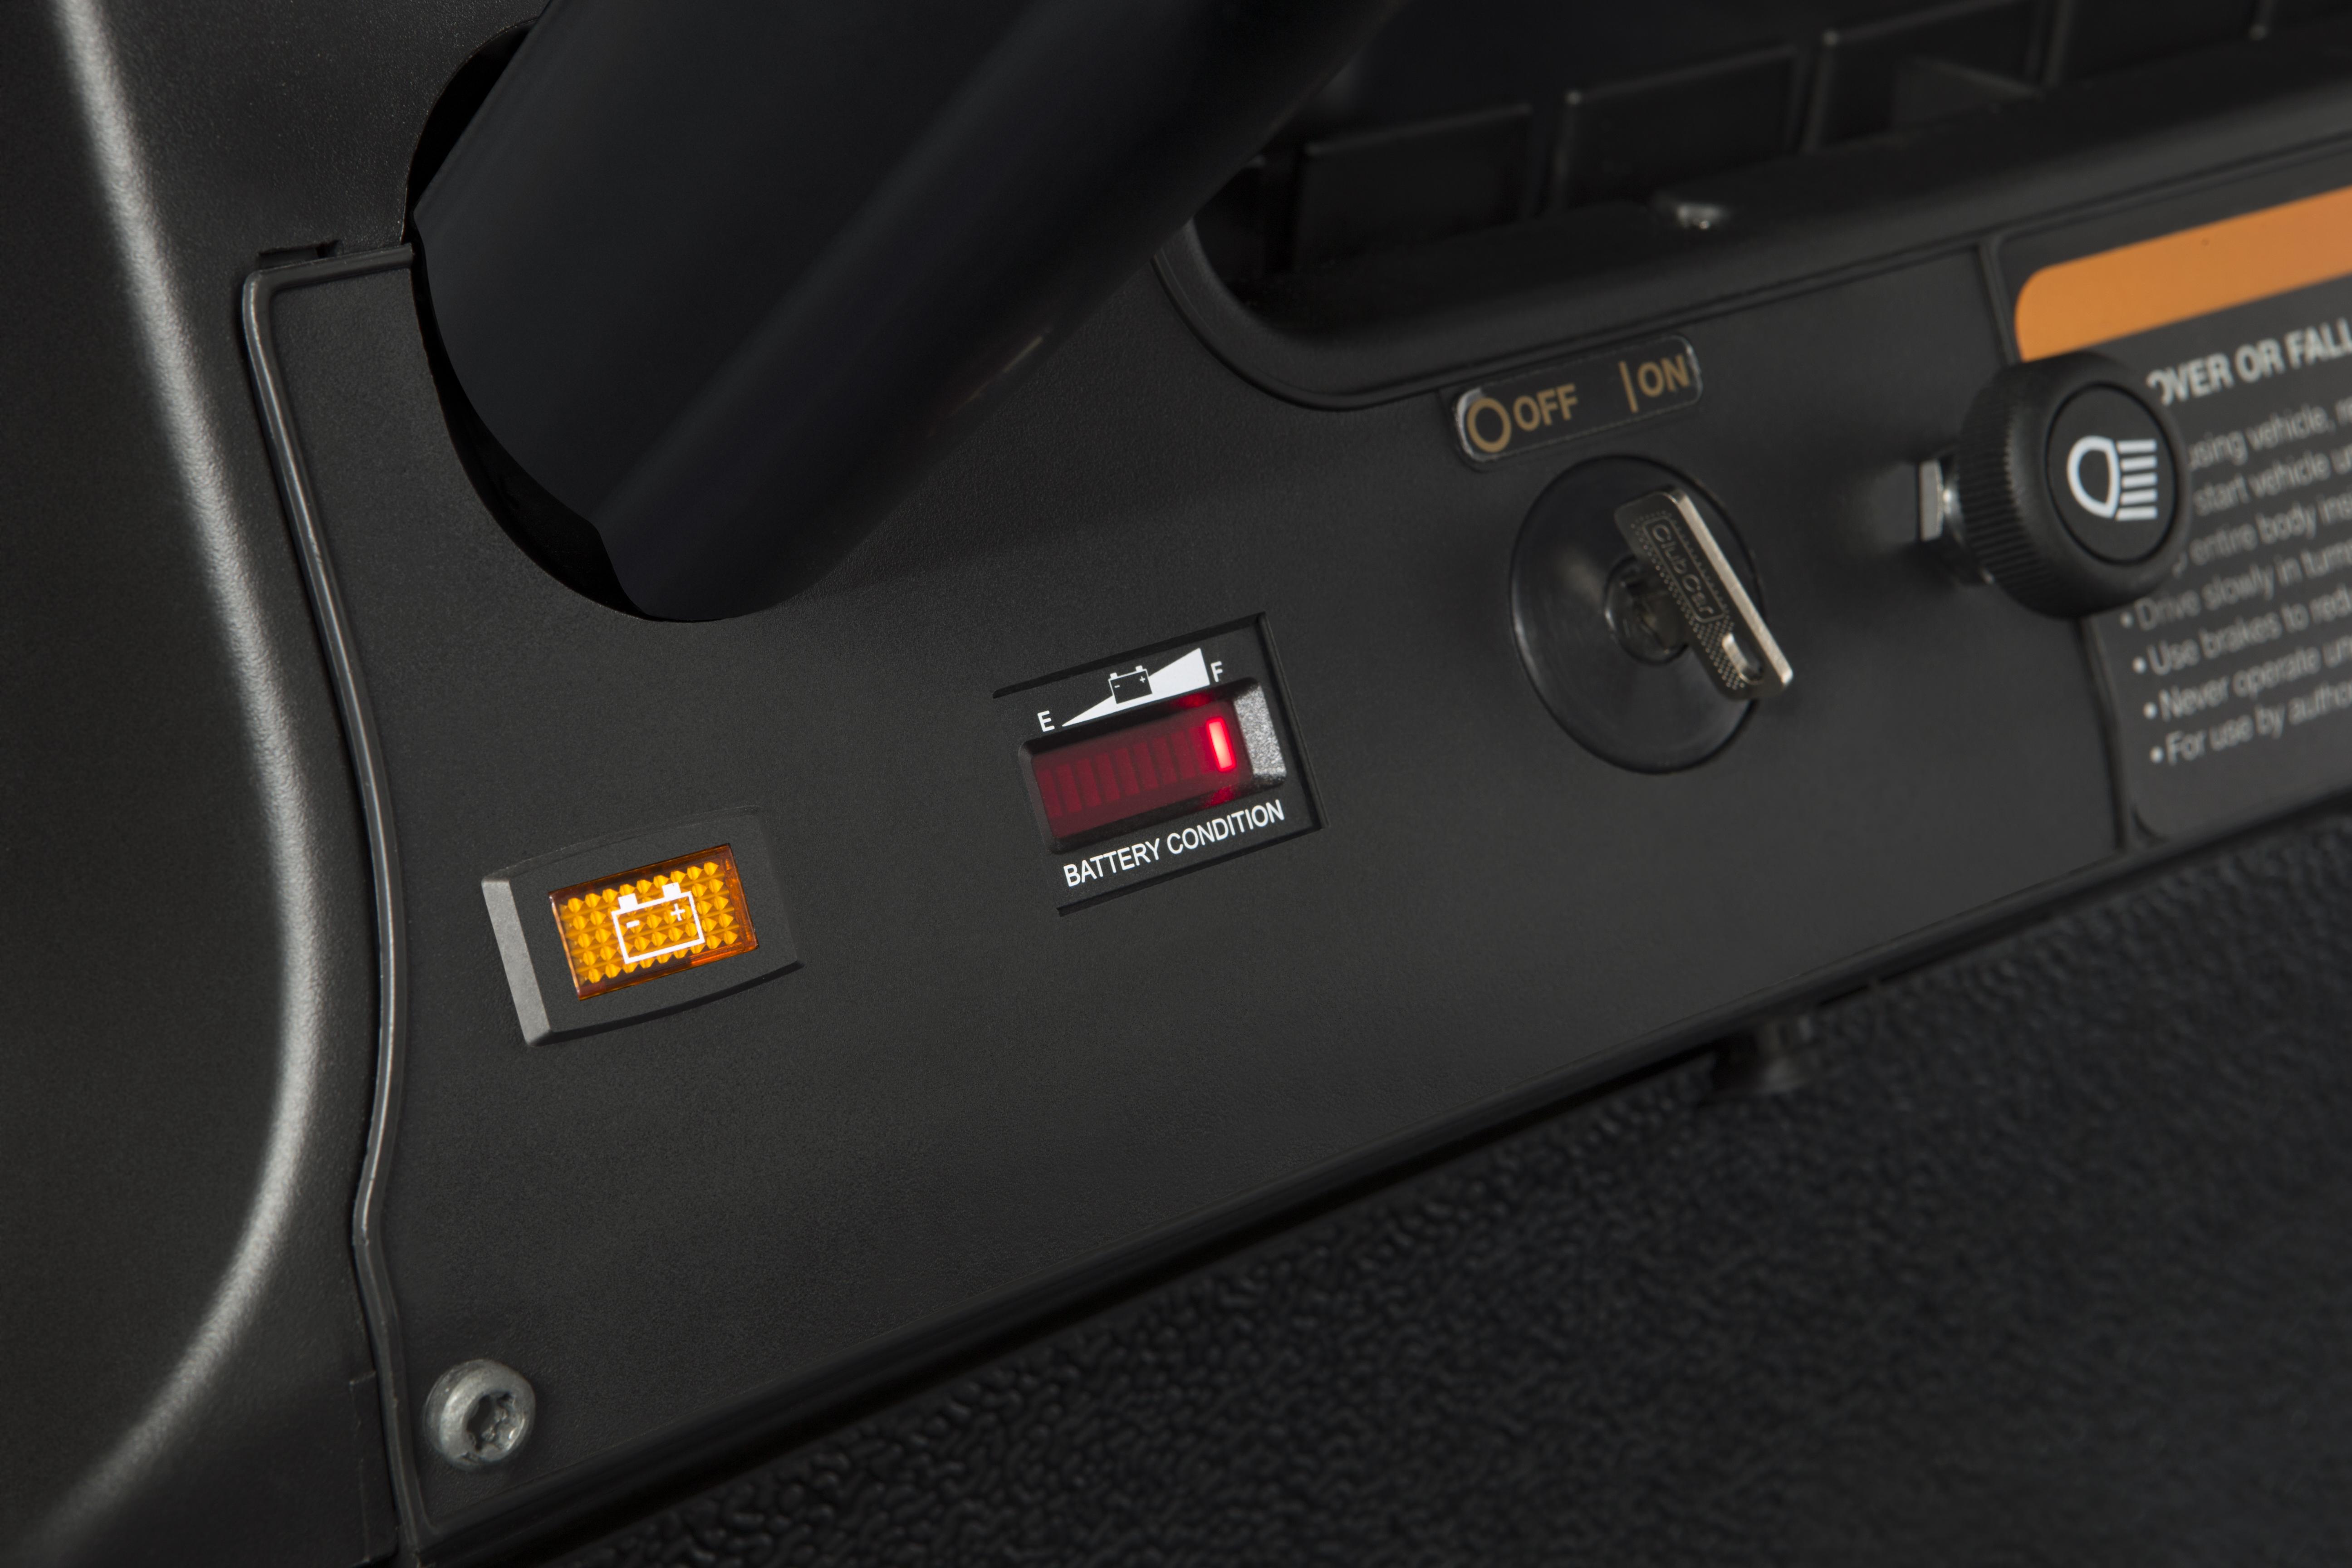 entretien des batteries de voiturettes de golf mobilicab. Black Bedroom Furniture Sets. Home Design Ideas